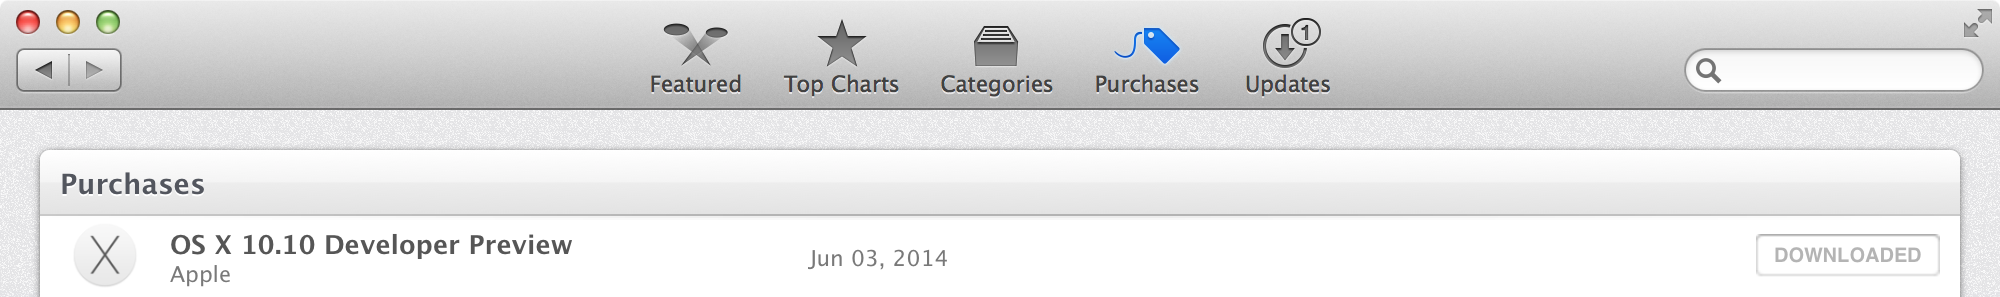 Mac App Store Yosemite